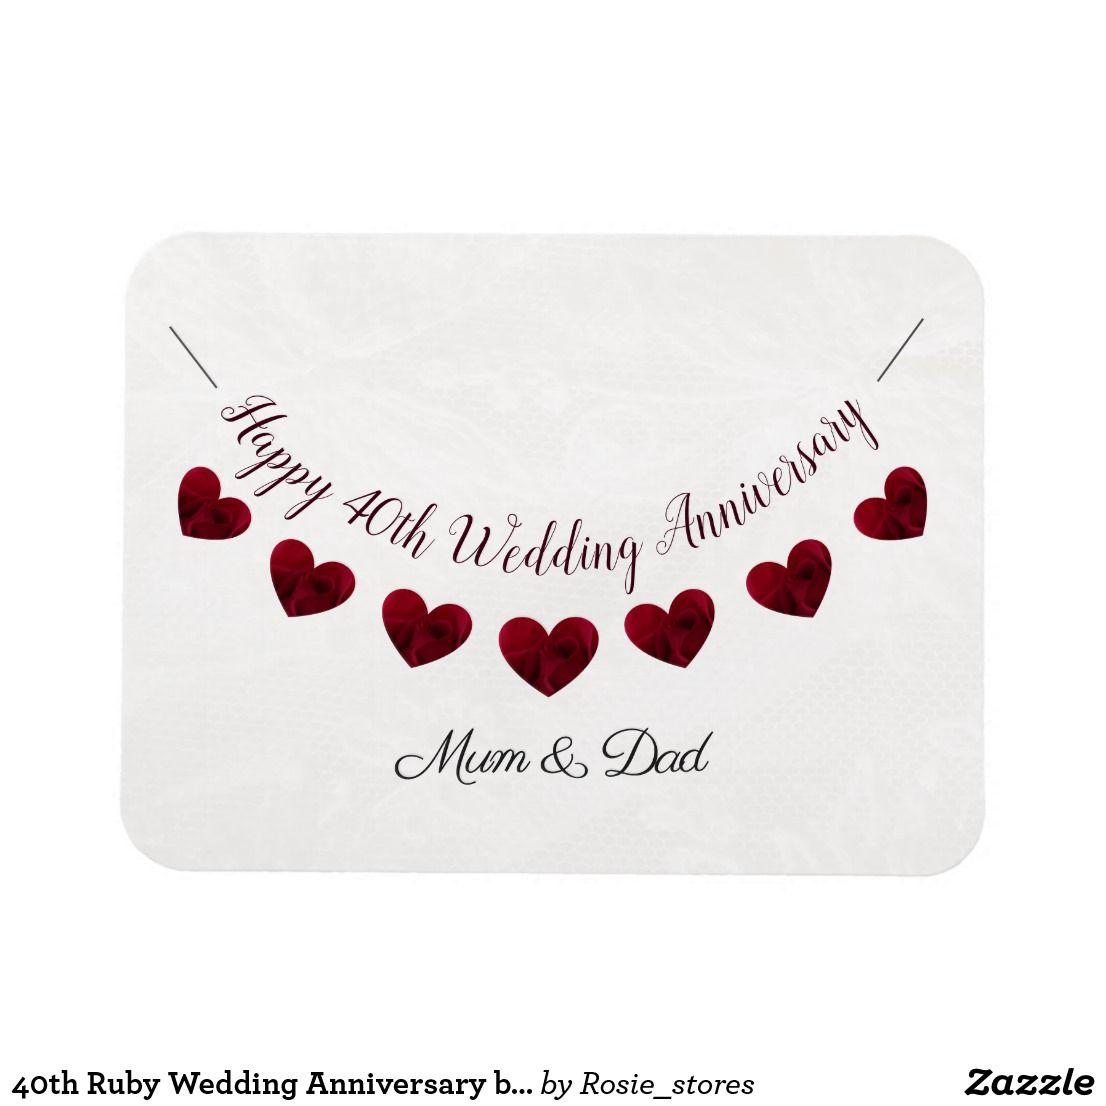 40th Ruby Wedding Anniversary Bunting Mum Dad Magnet Zazzle Co